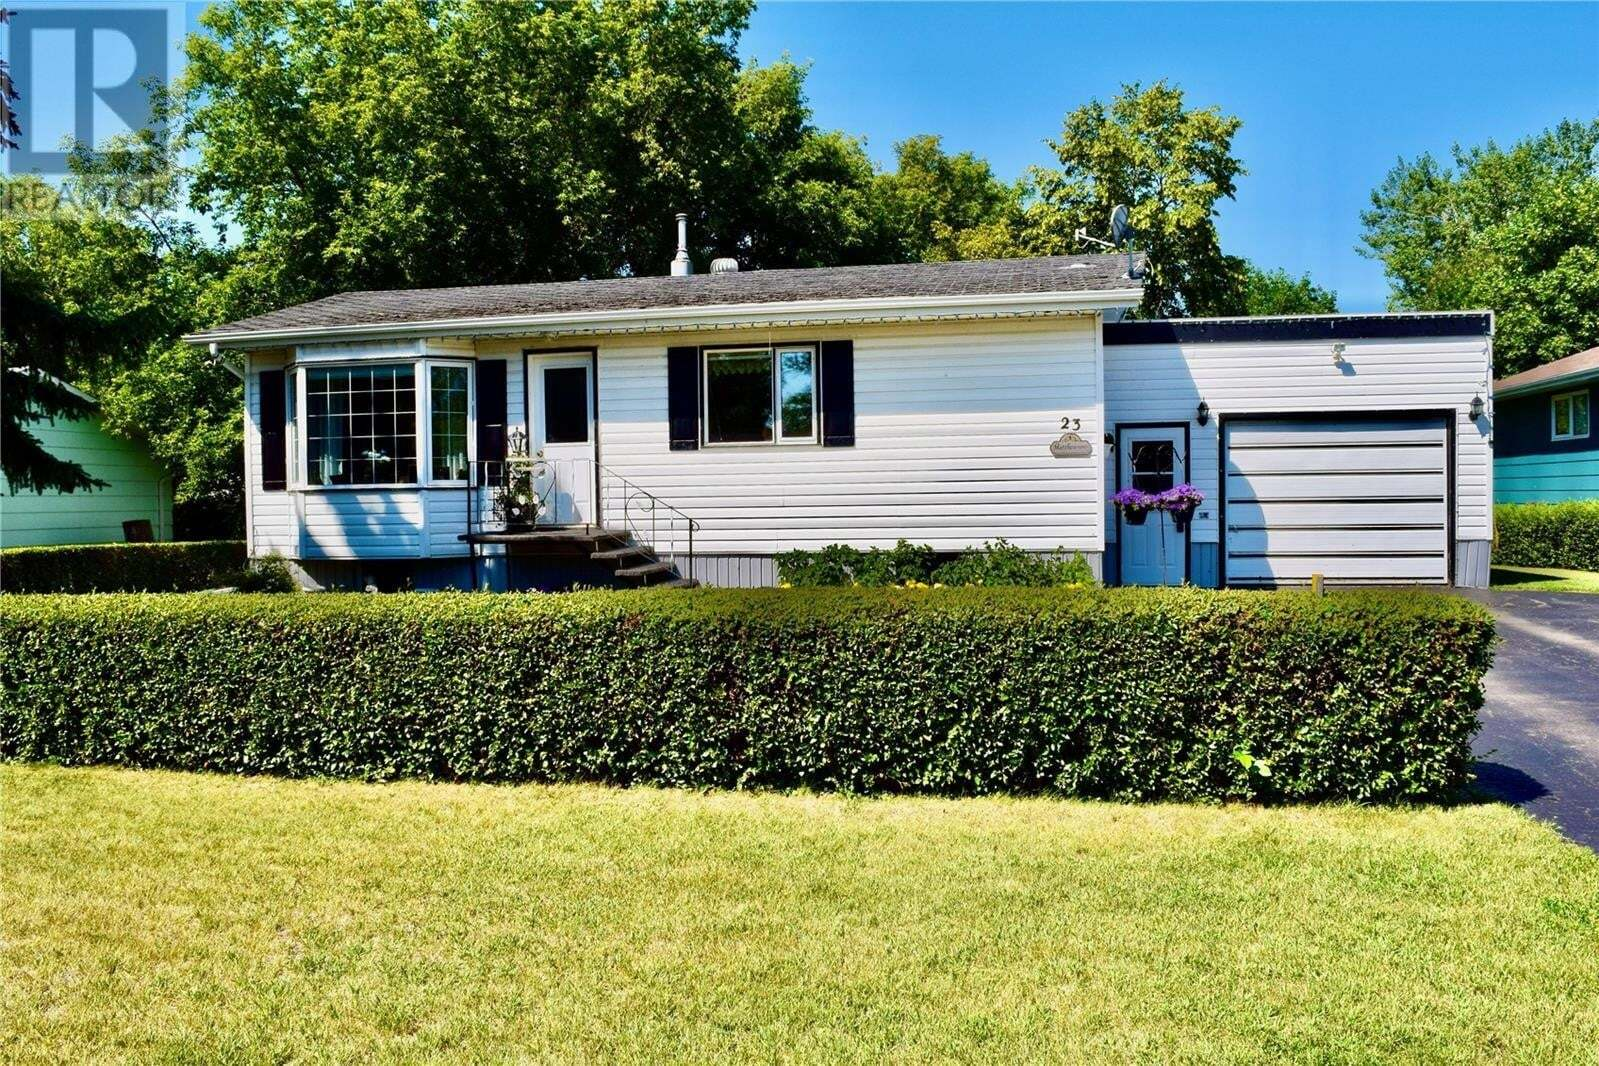 House for sale at 23 Warren St Redvers Saskatchewan - MLS: SK818455